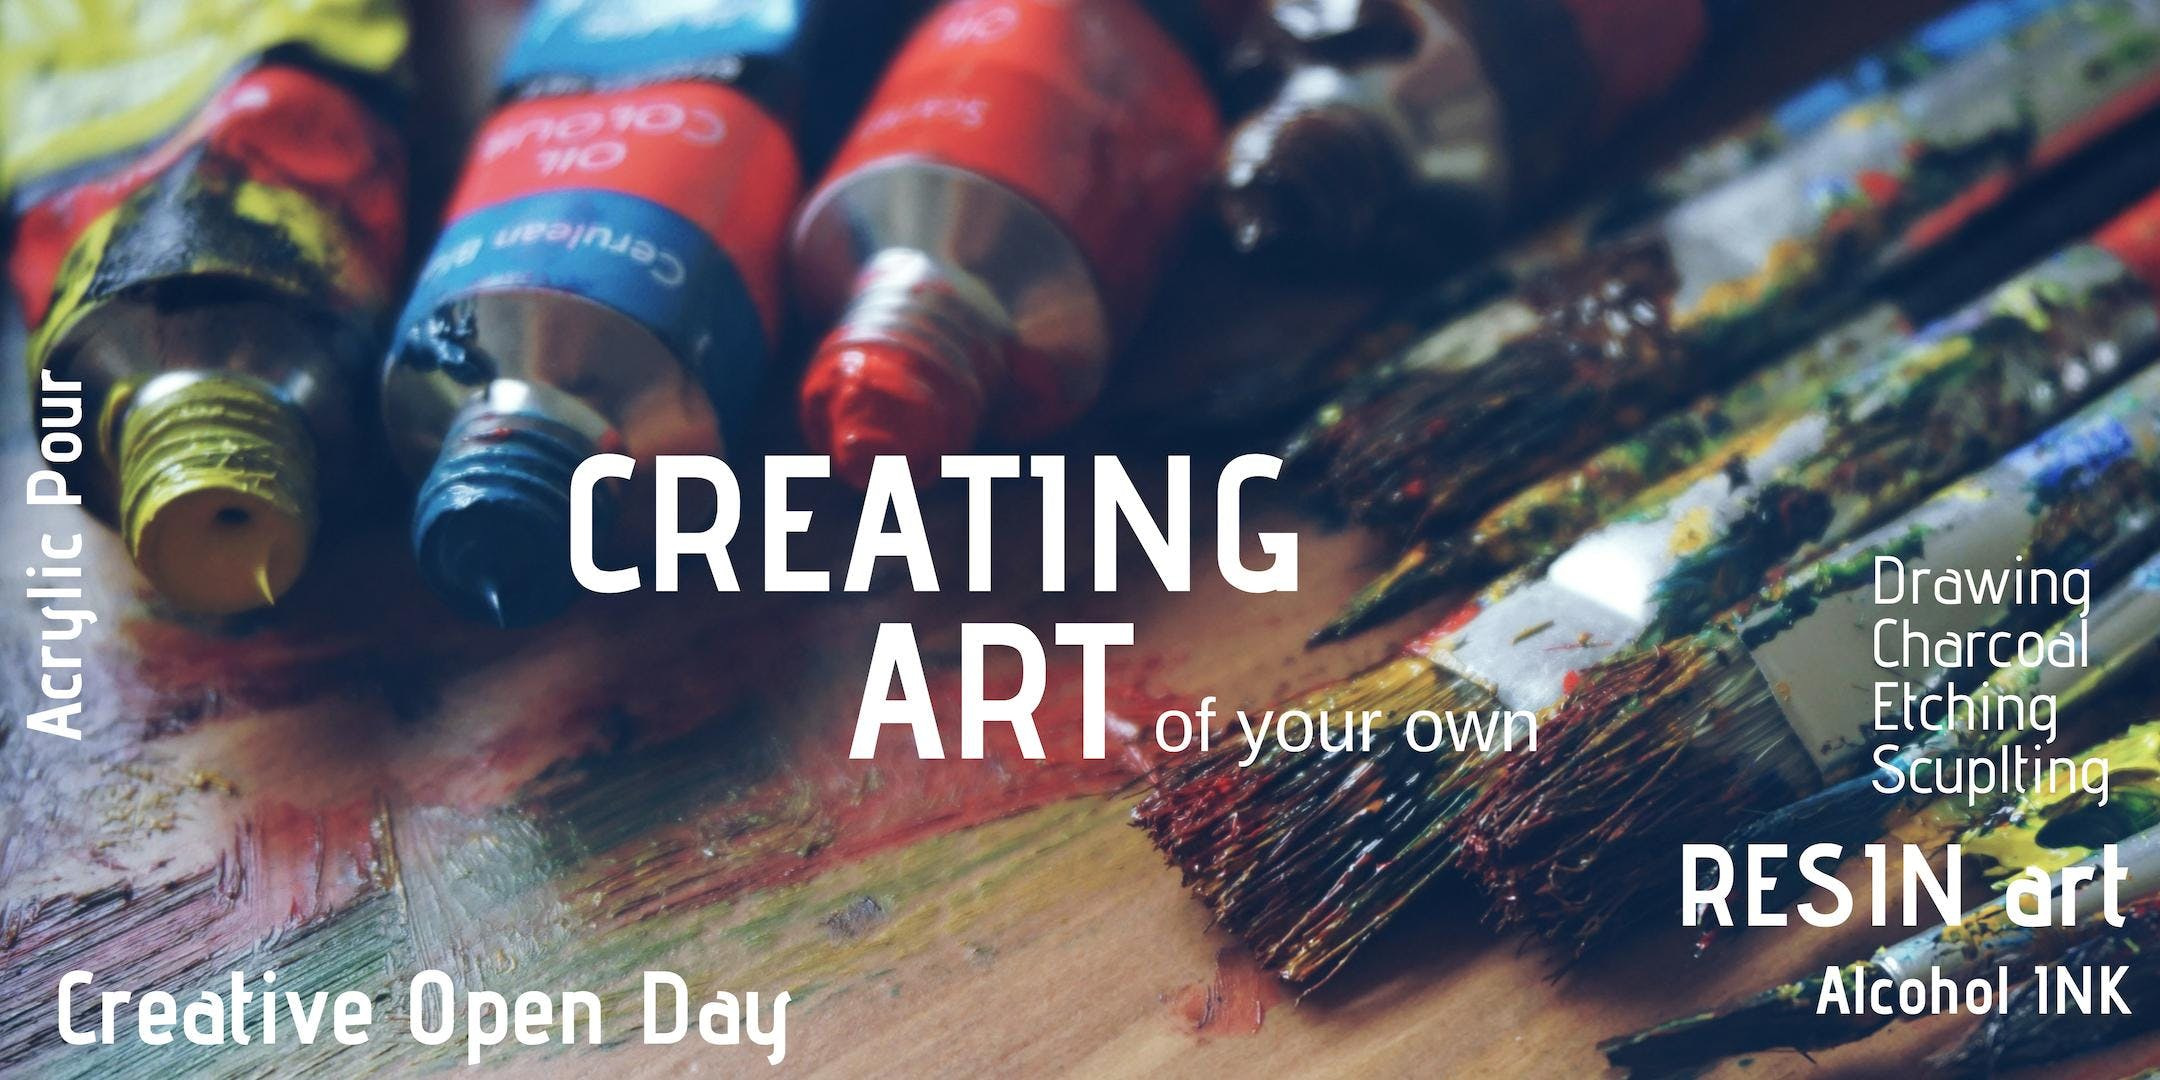 Creating Art - Saturday 9th Feb 3.00pm